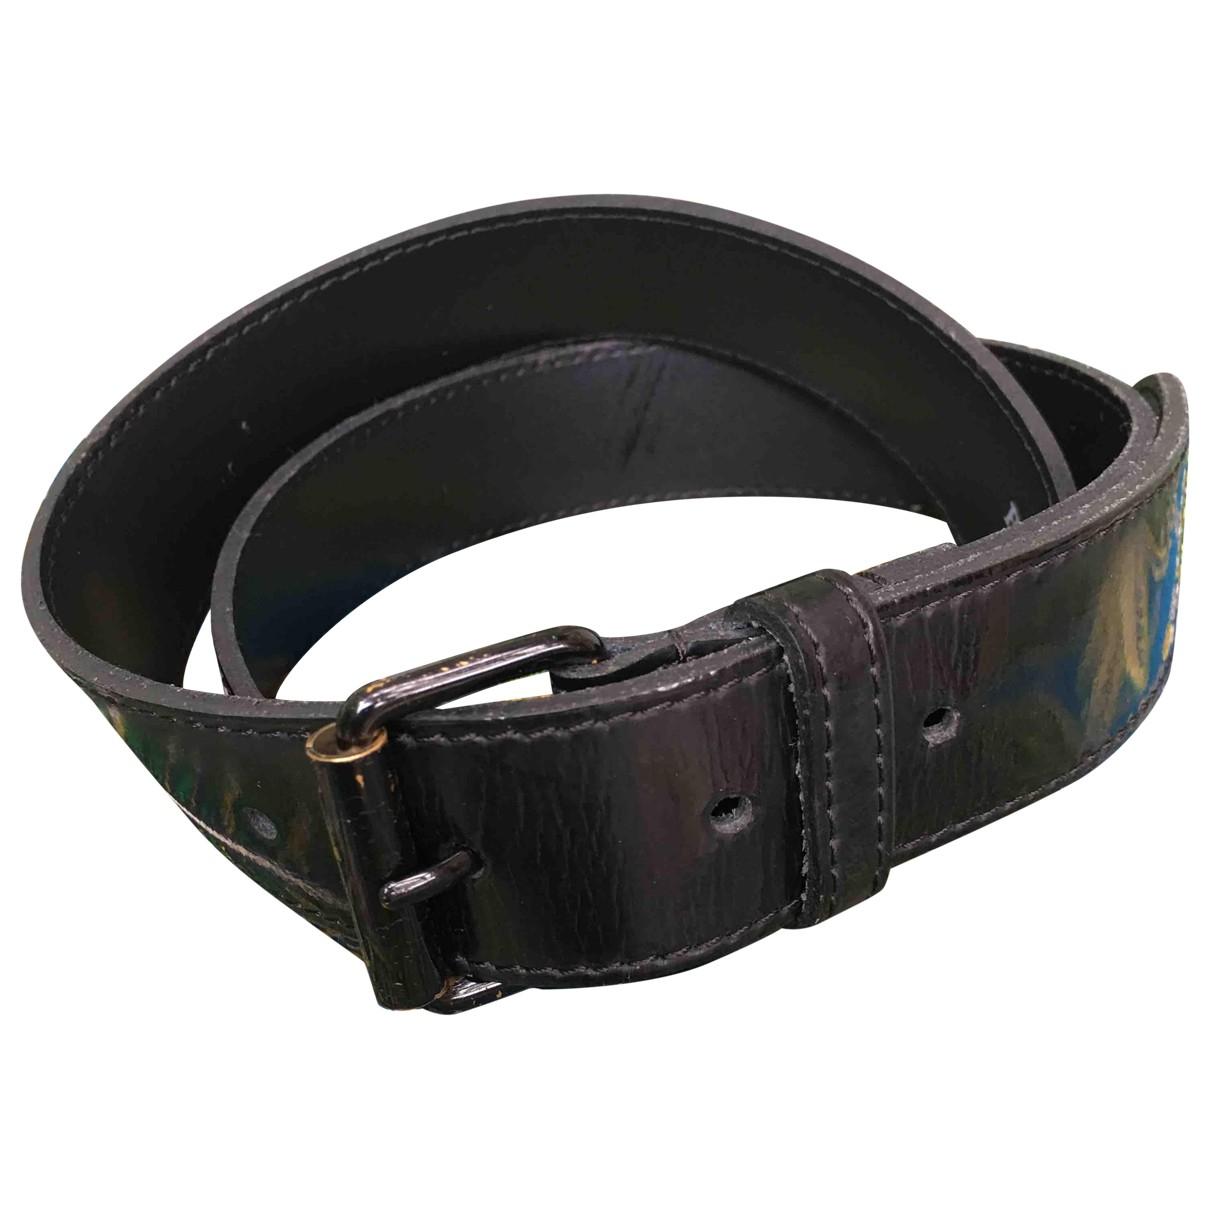 Burberry \N Black Leather belt for Women 75 cm